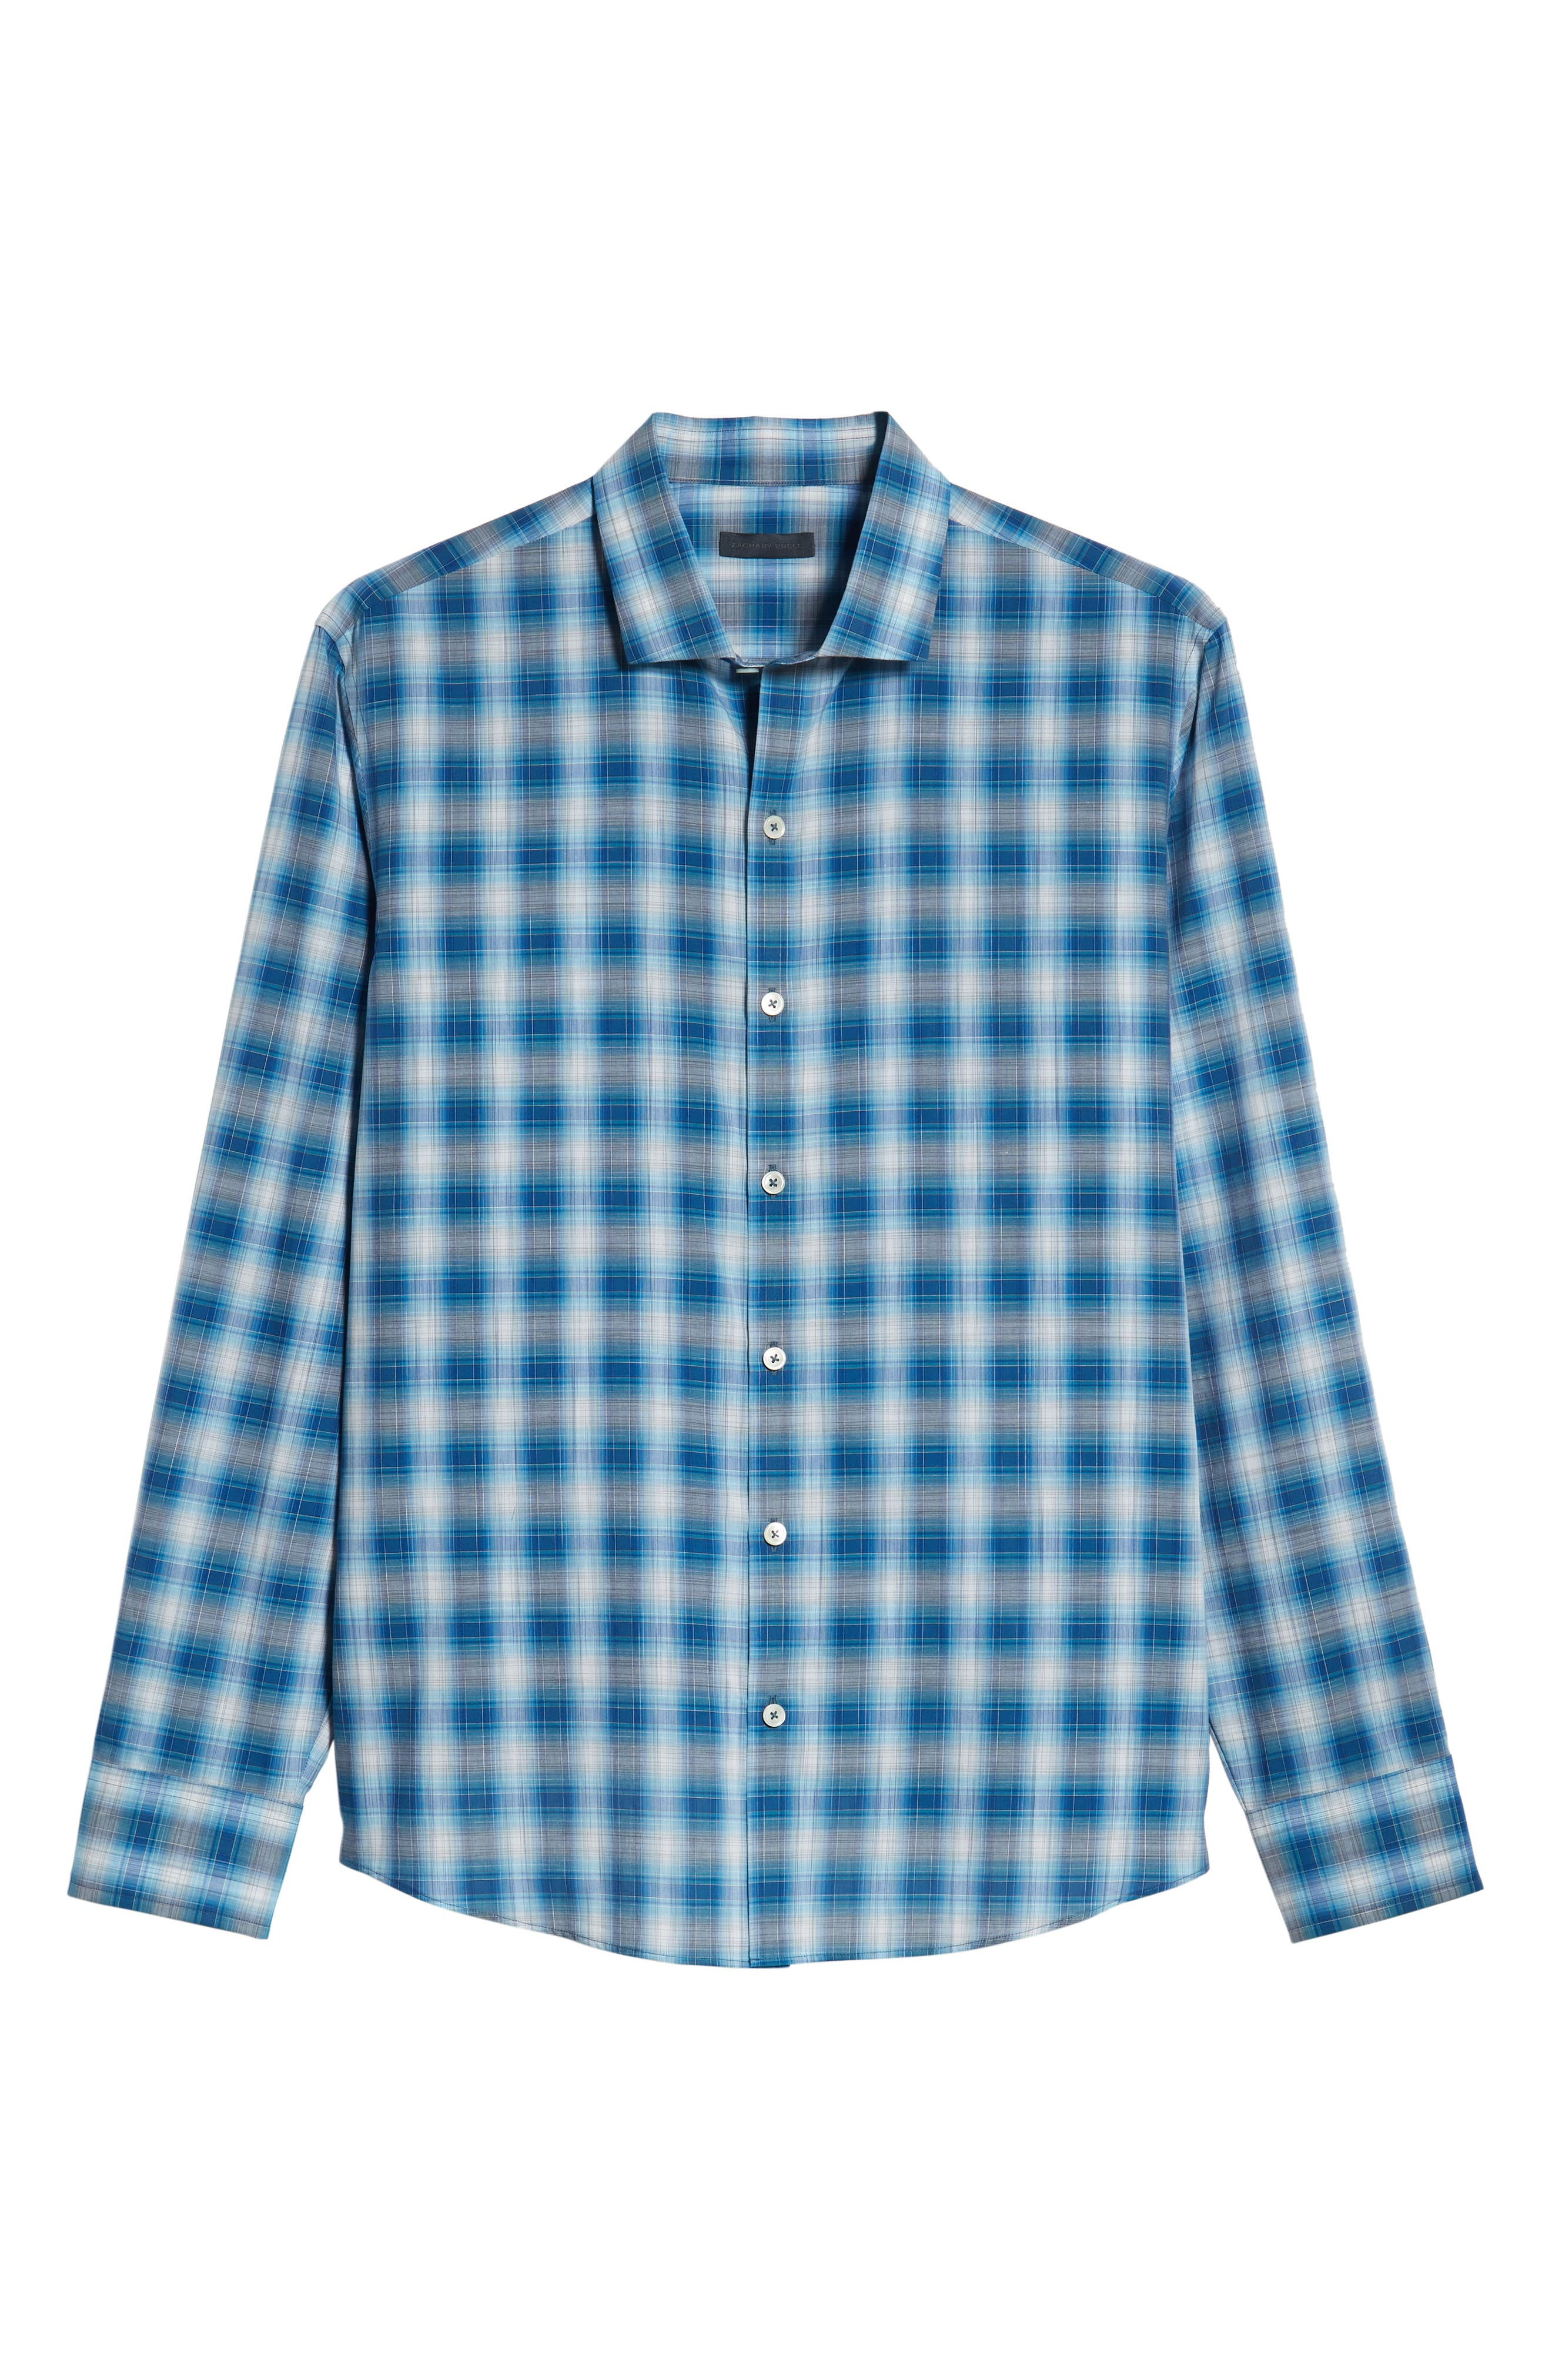 Holtsinger Plaid Sport Shirt,                             Alternate thumbnail 5, color,                             BRIGHT BLUE